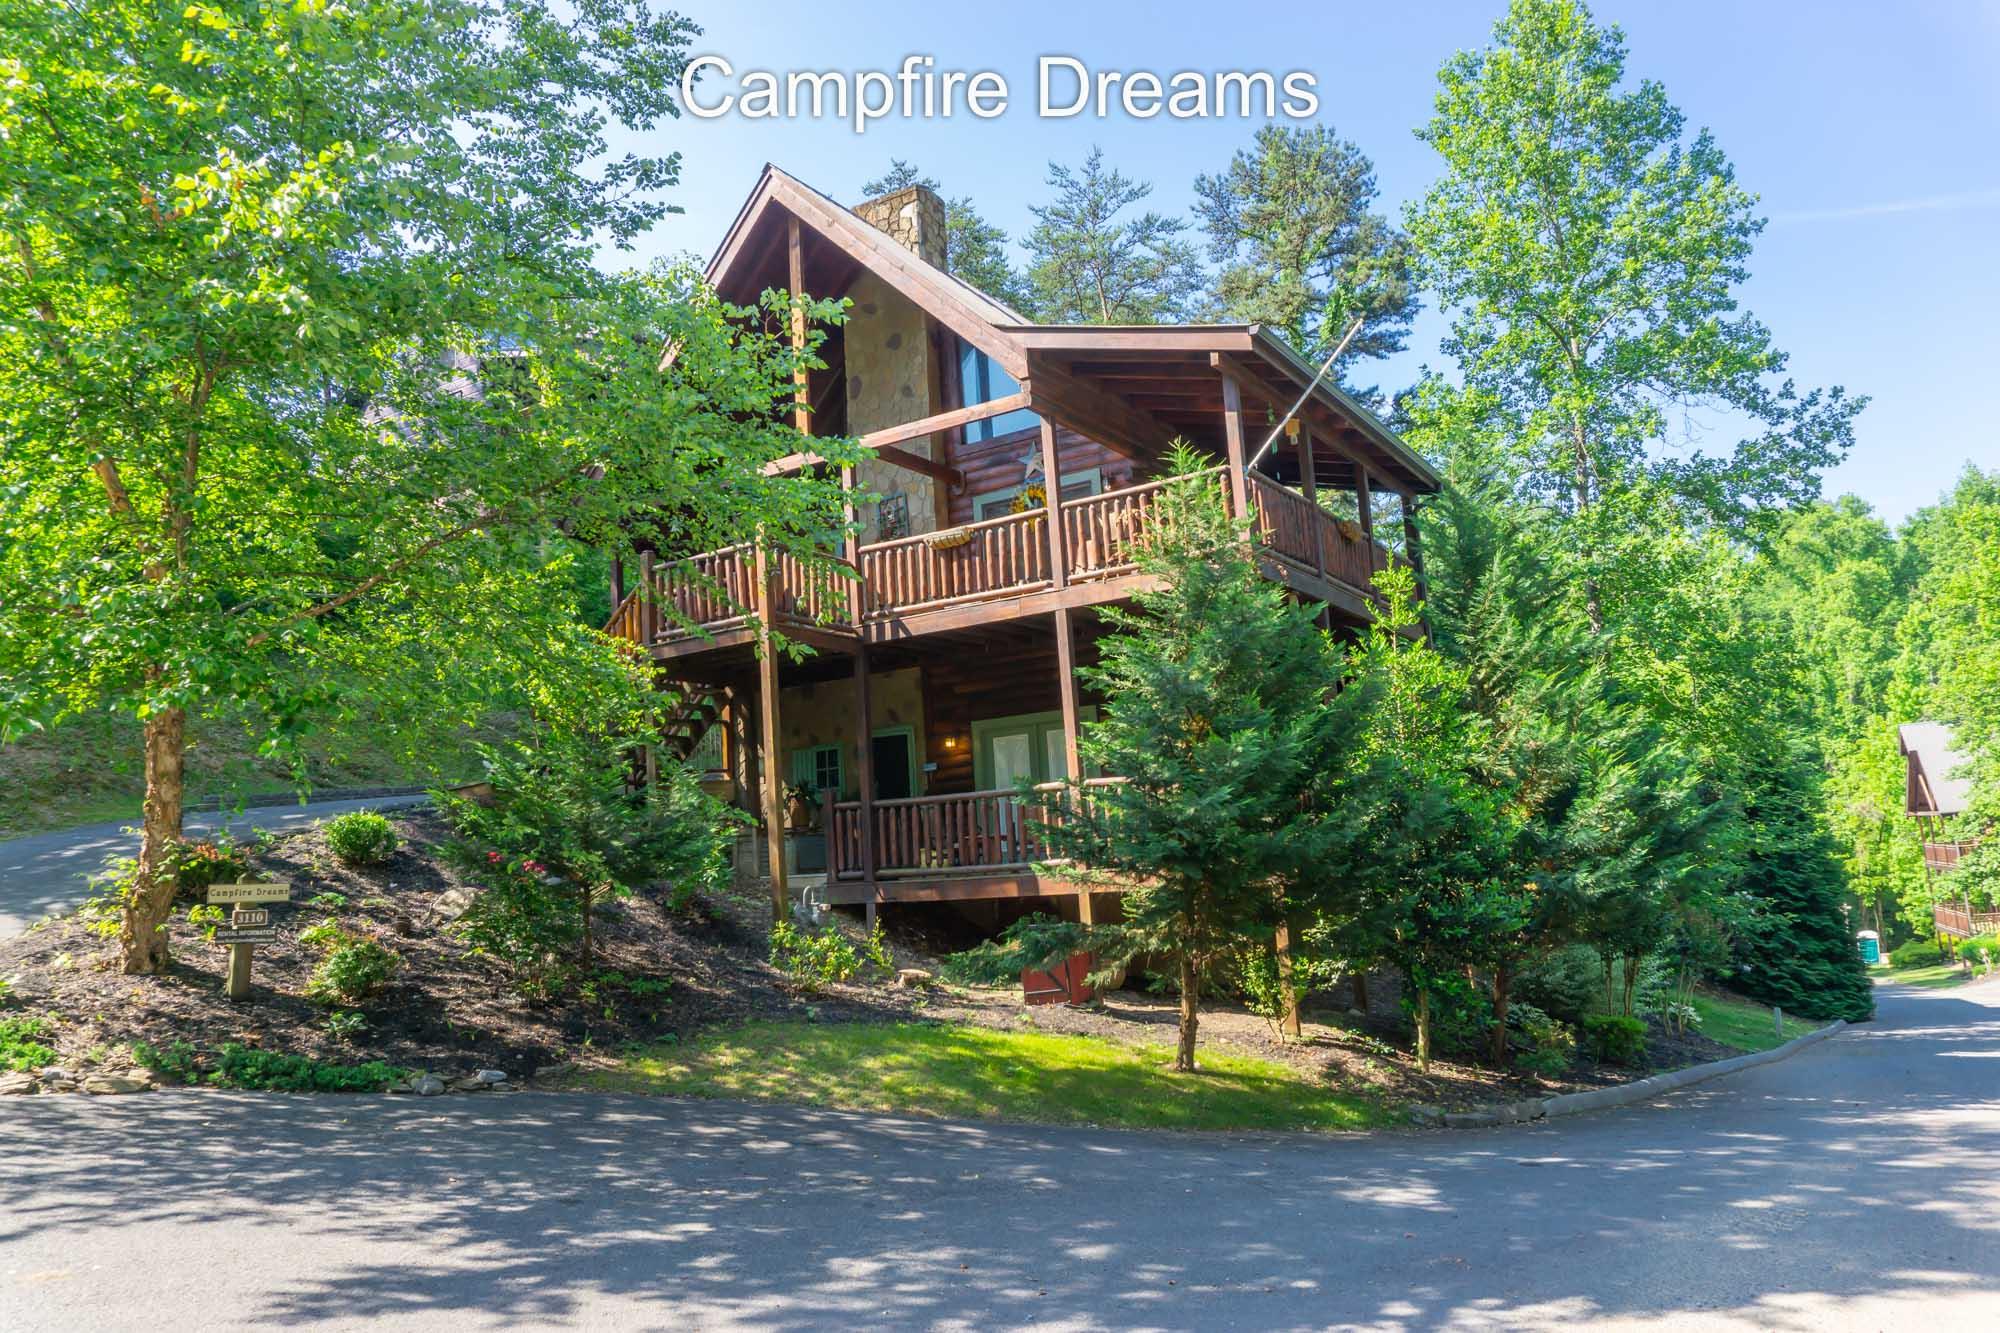 Campfire Dreams is a 2-KING suite cabin